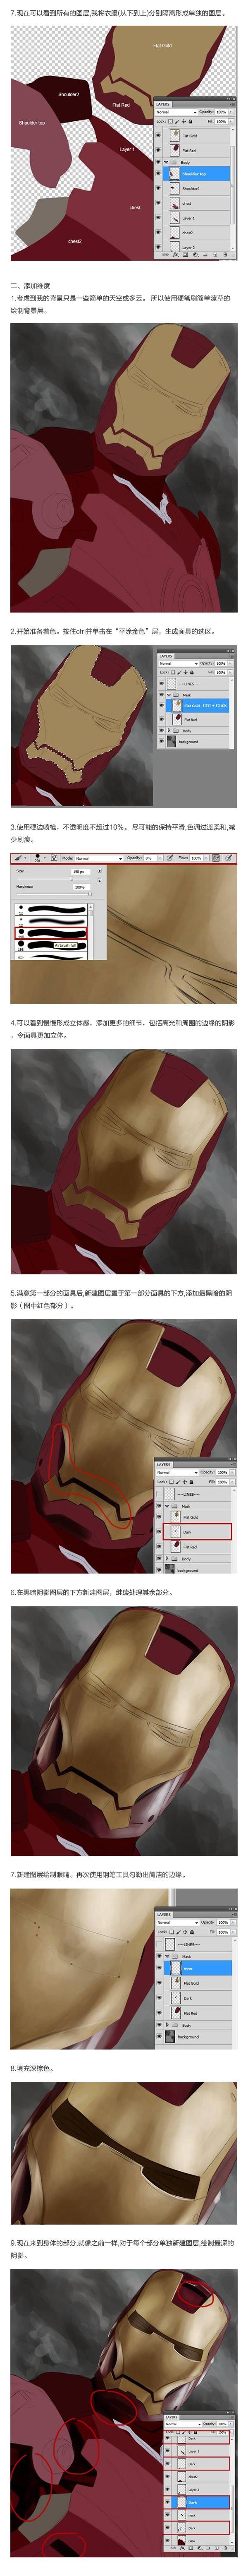 Photoshop繪製金屬質感的鋼鐵俠機器人